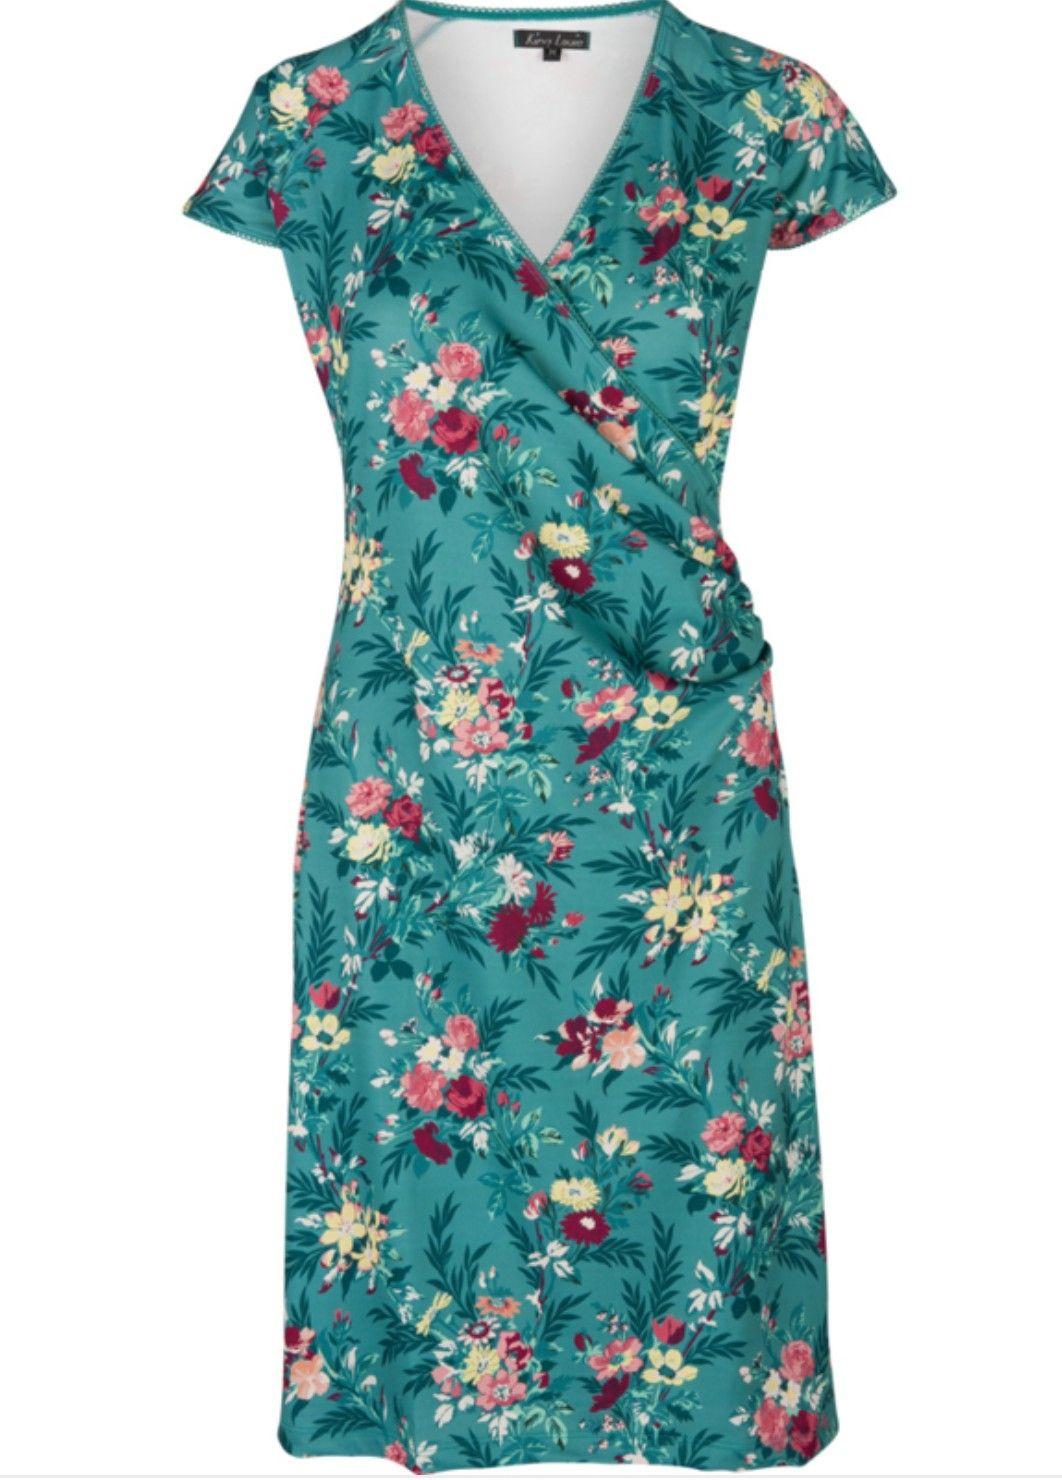 king louie cross dress provence